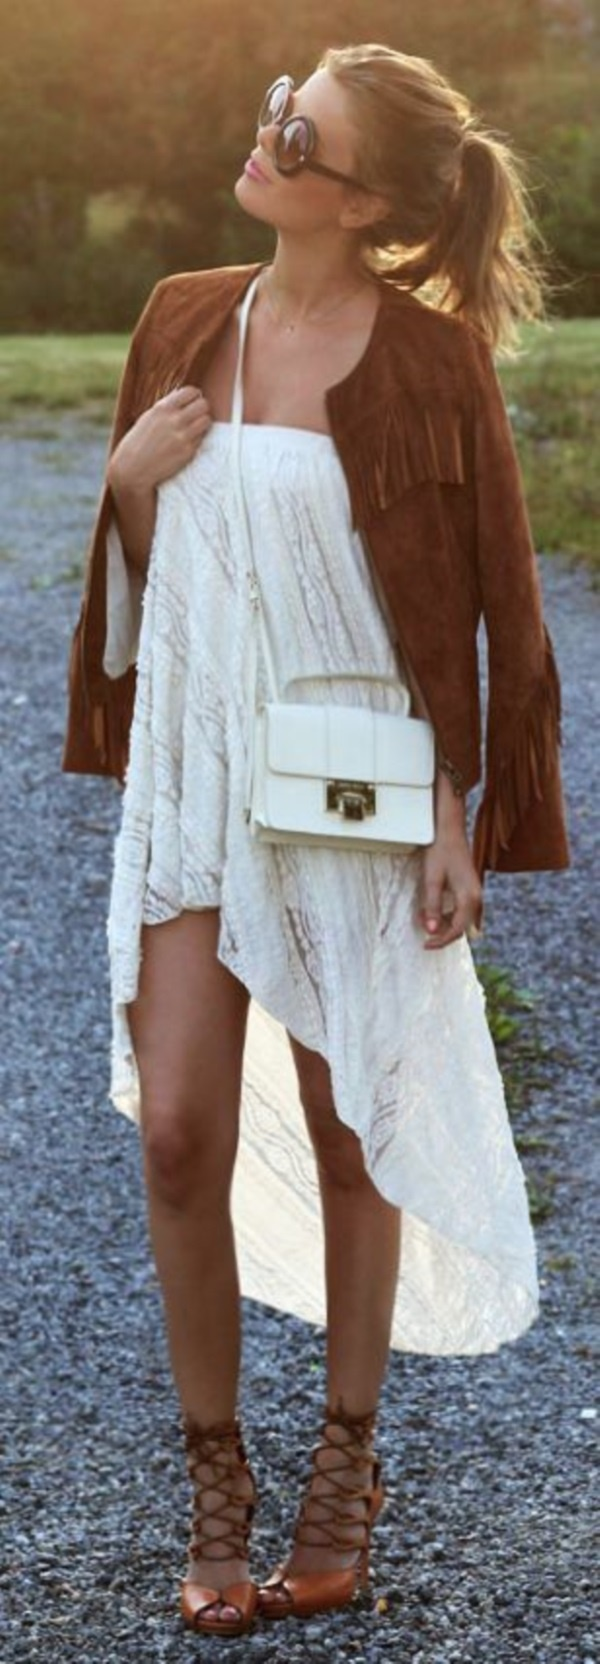 boho chic fashions outfits0421